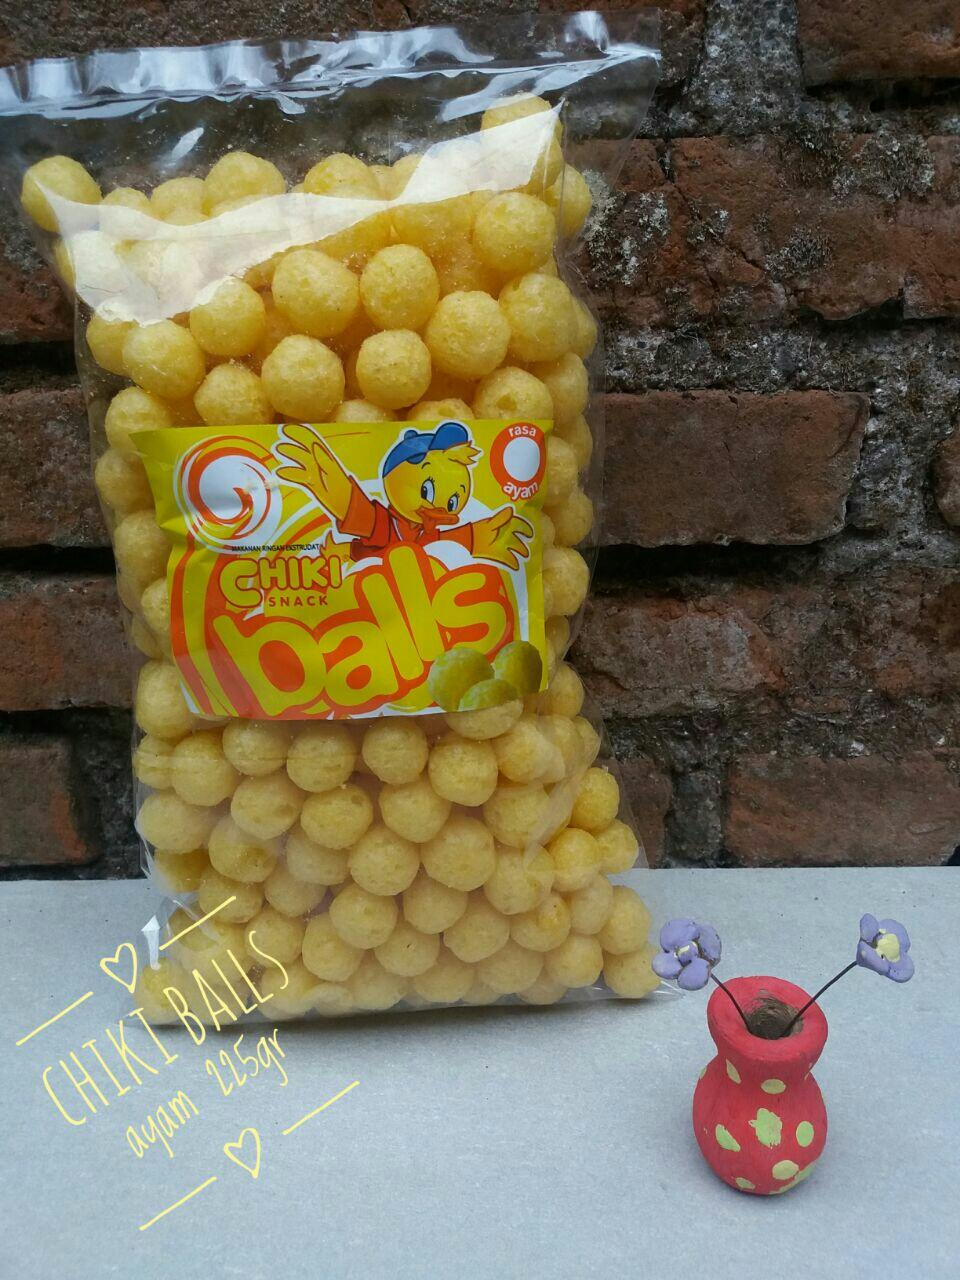 Snack Indofood Cek Harga Terkini Dan Terlengkap Indonesia Paket Chitato Cheetos Chiki Isi 5 Kiloan Ball